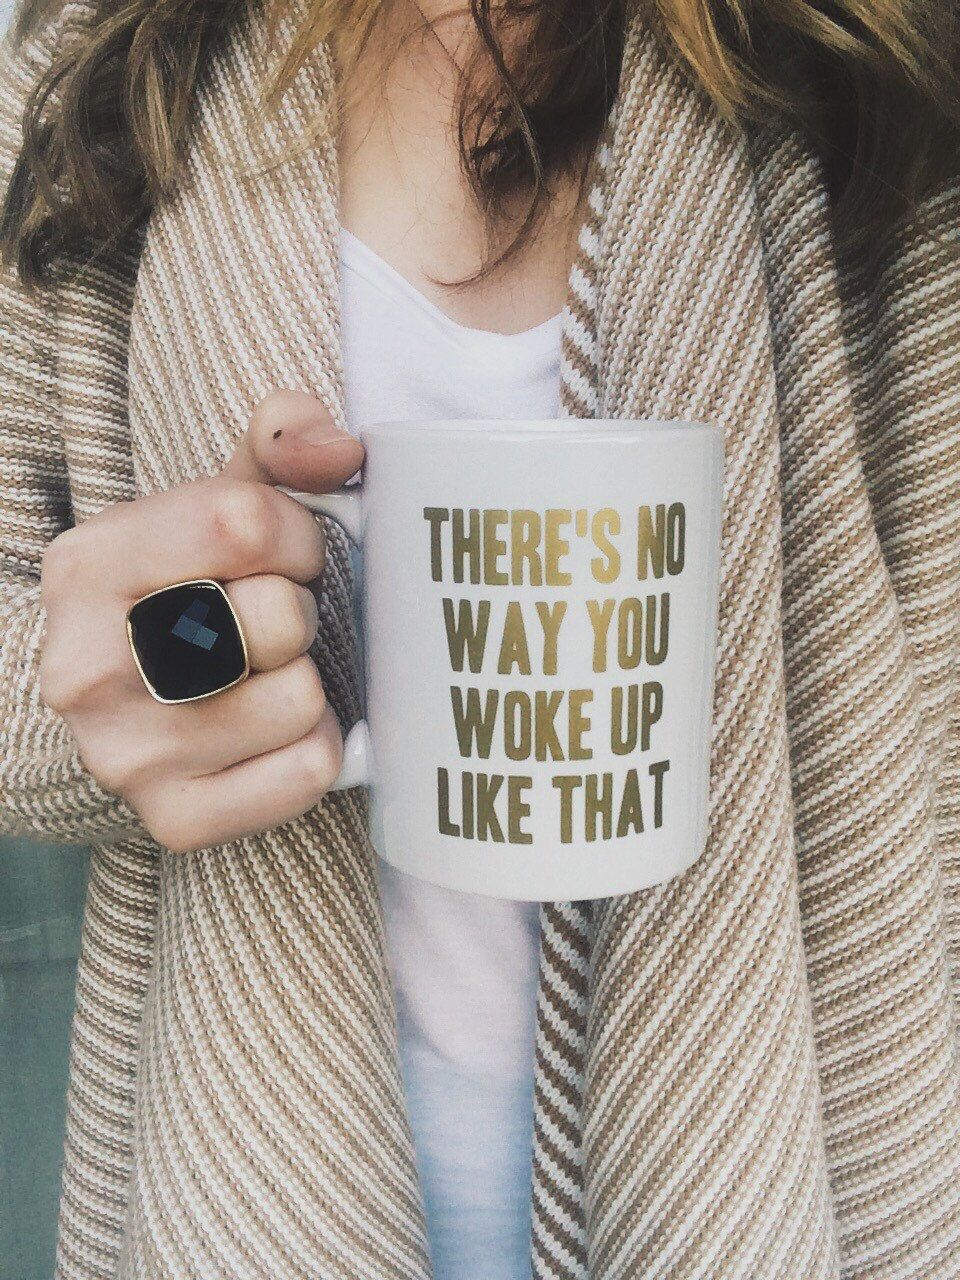 "<a href=""https://www.etsy.com/listing/225260203/i-woke-up-like-this-funny-coffee-mug#_a5y_p=3737341"">I Woke Up Like This Funn"